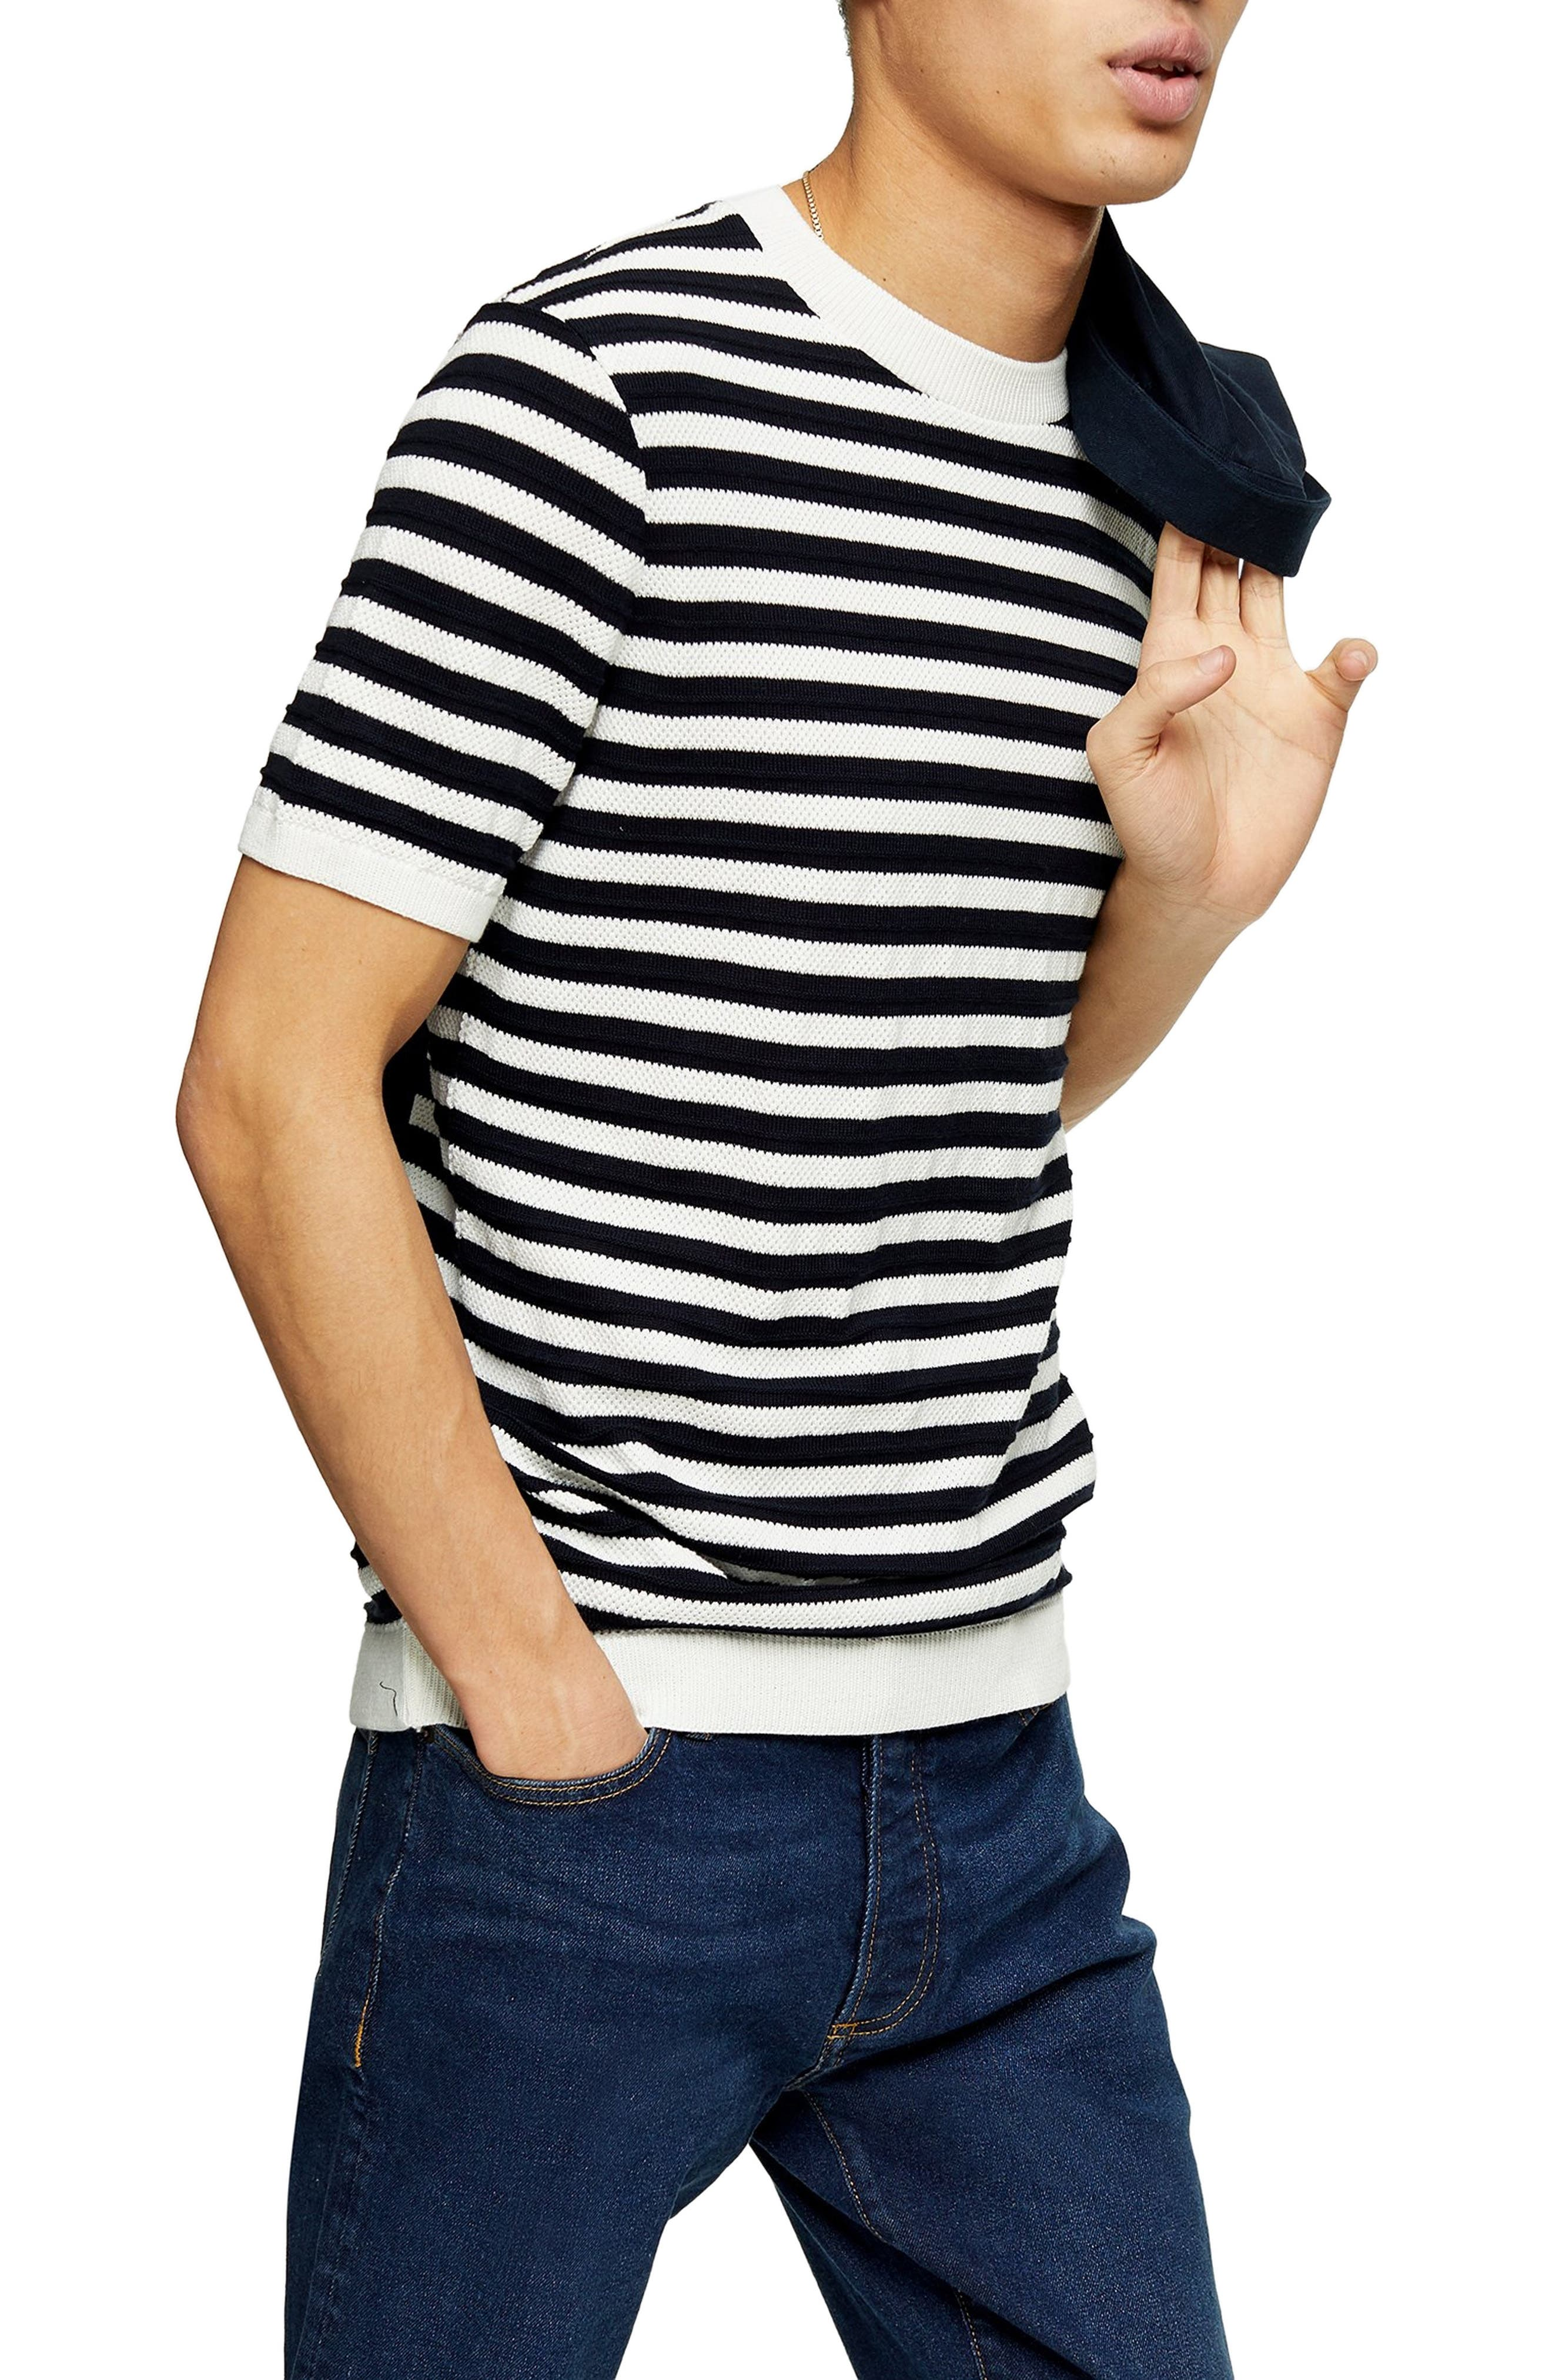 1940s Men's Shirts, Sweaters, Vests Mens Topman Stripe Knit T-Shirt $27.00 AT vintagedancer.com